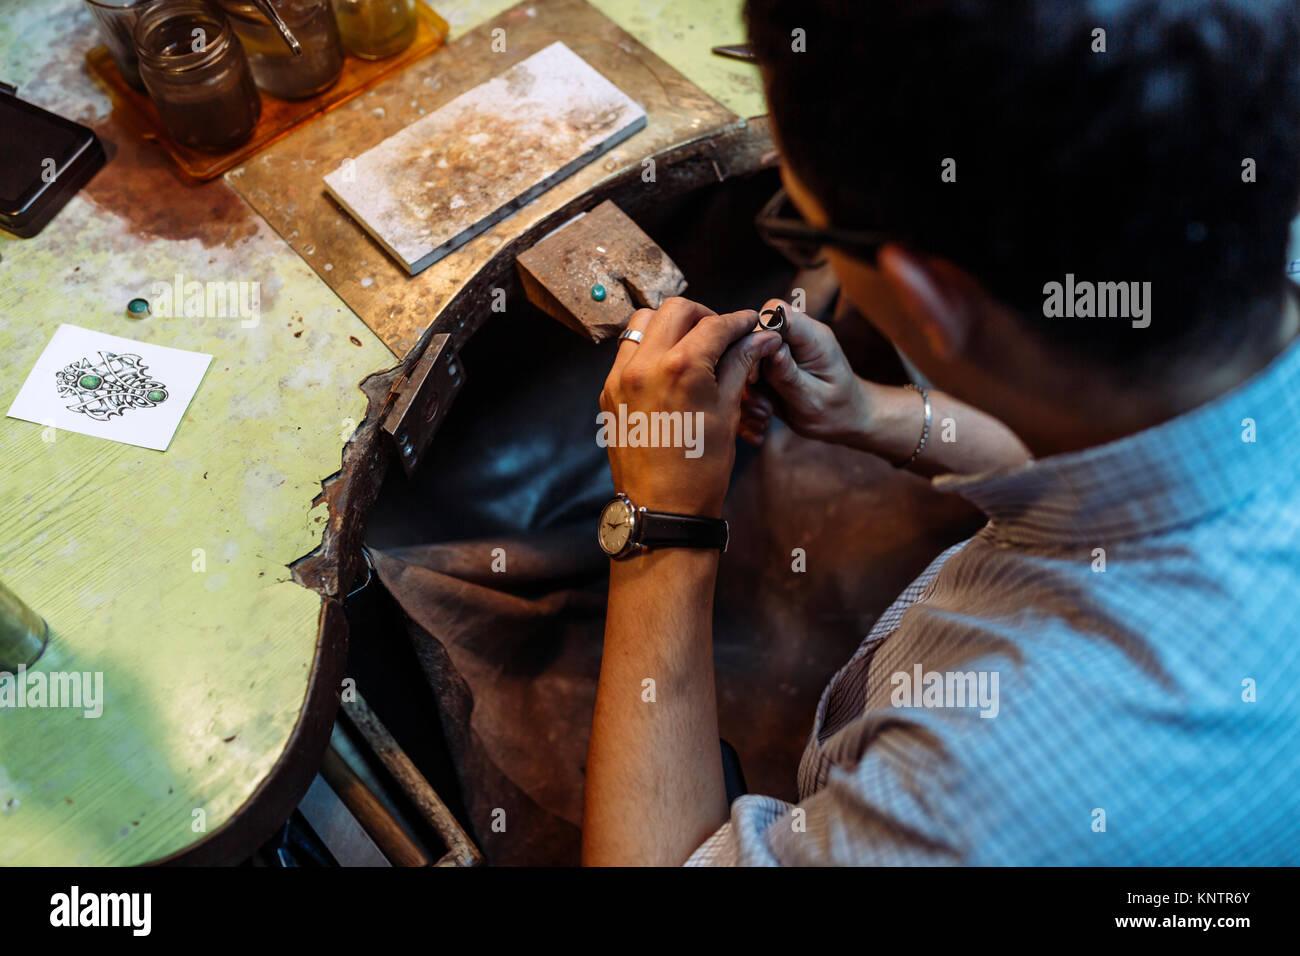 Craftsman working on workbench - Stock Image